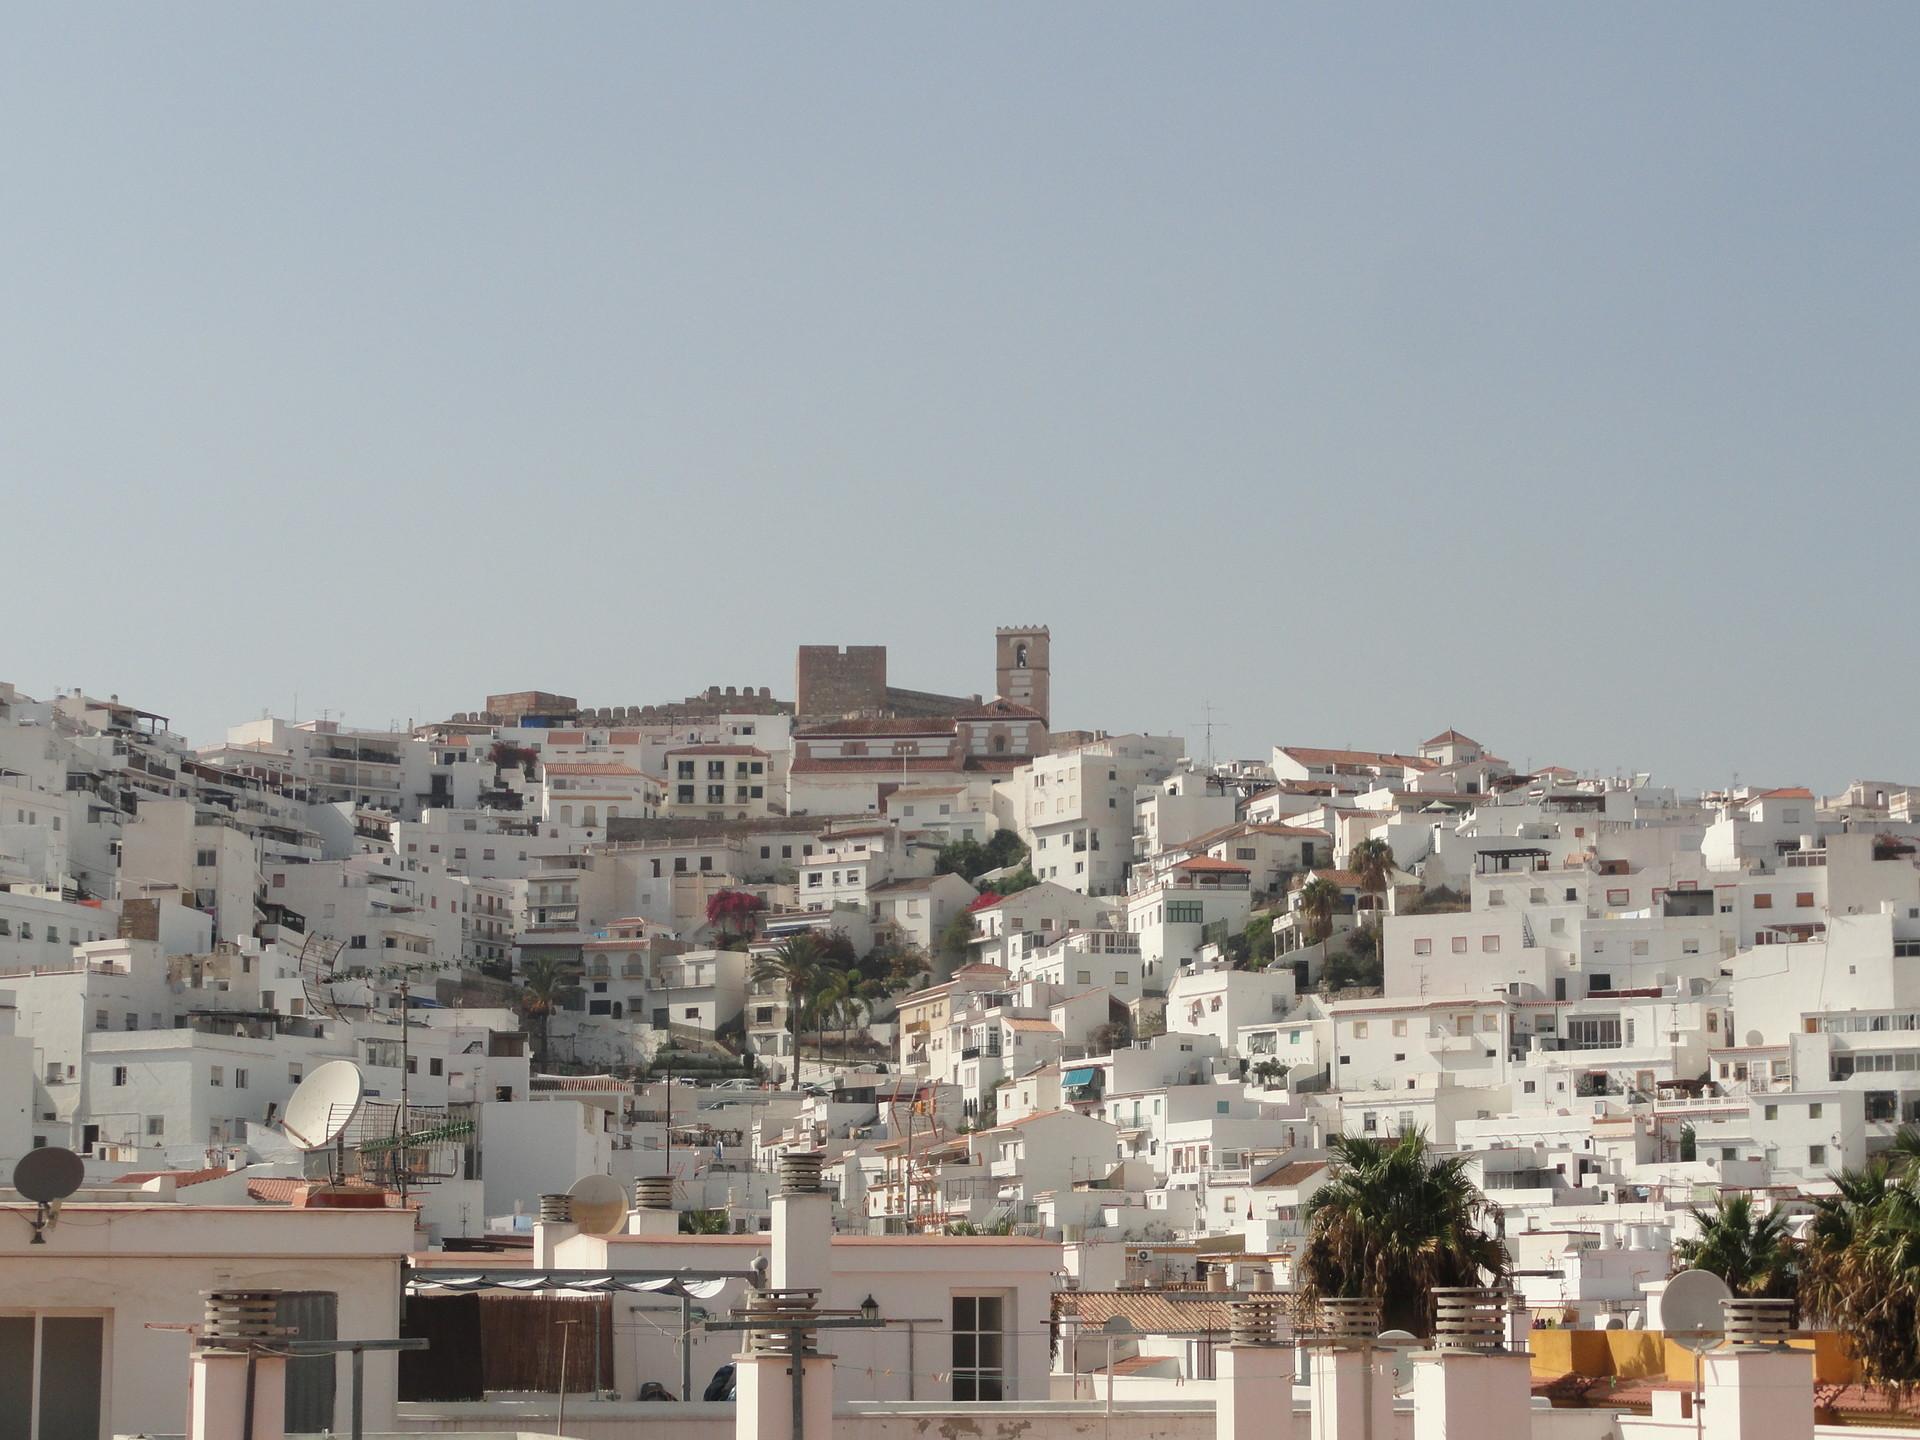 Salobreña, la joya de la costa granadina